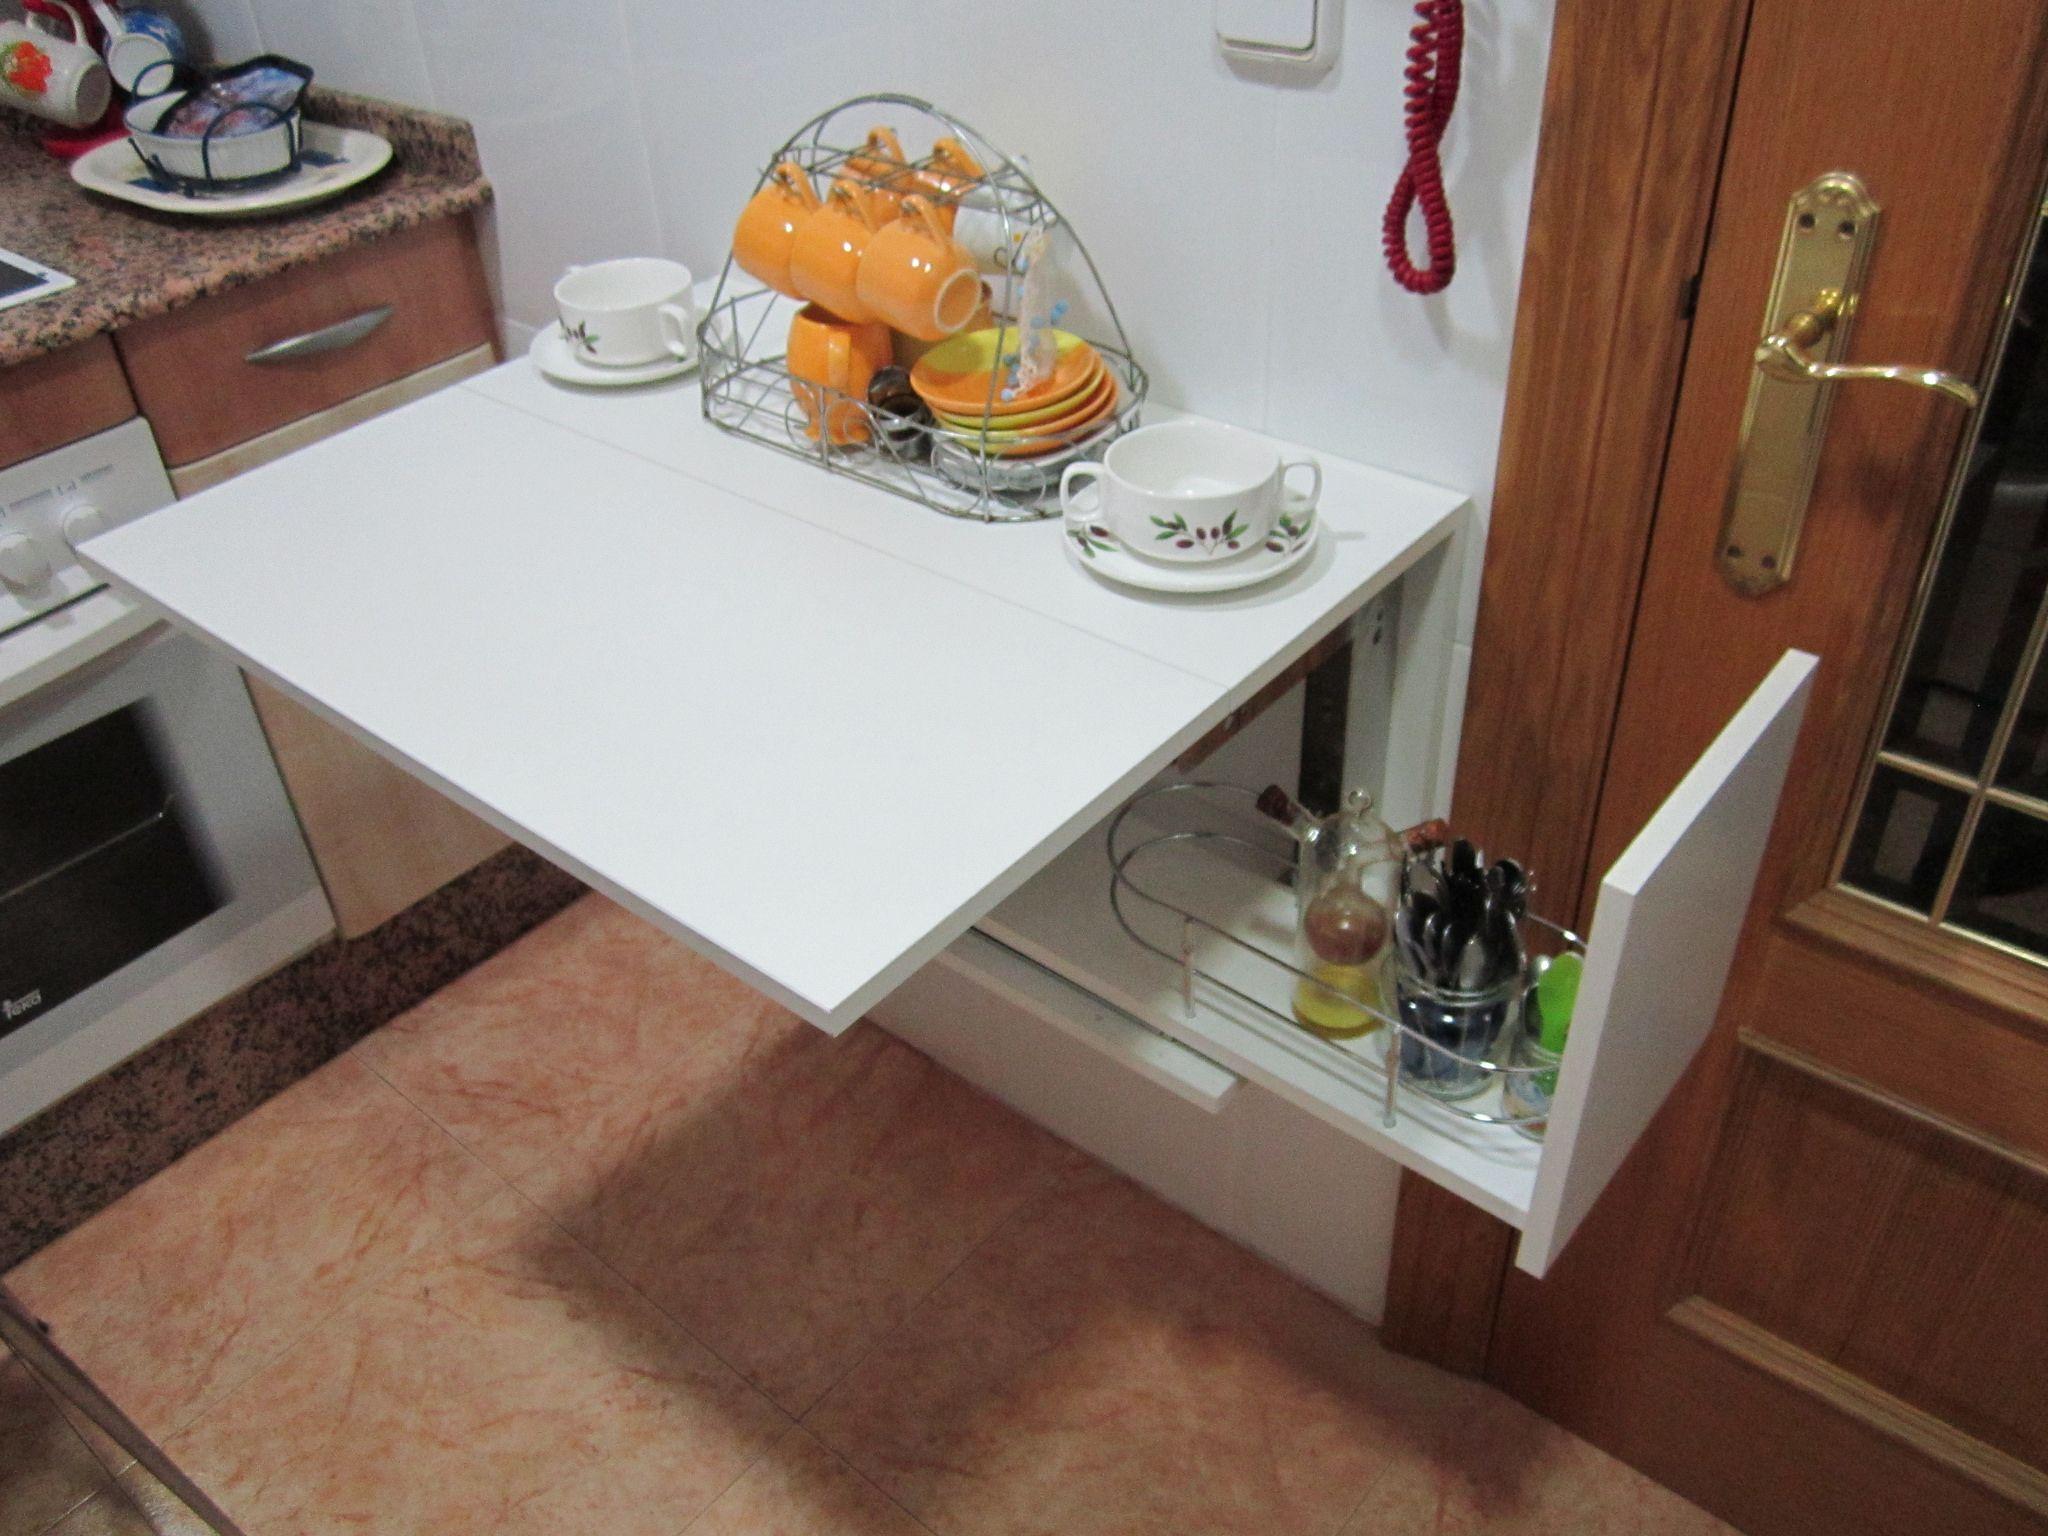 Mesa abatible en m dulo de cocina joster mesas for Modulos para cocina